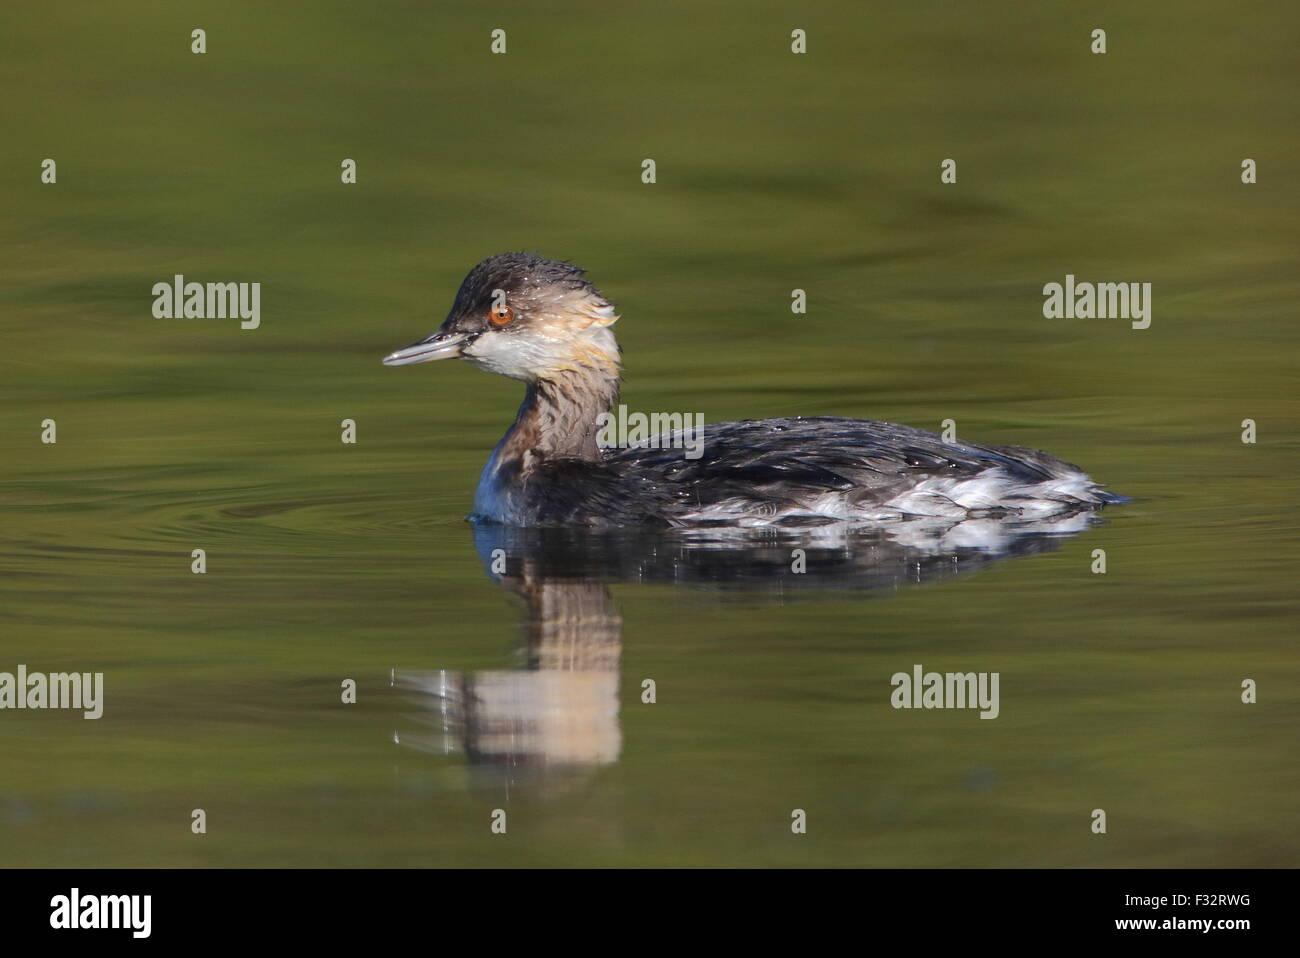 Black-necked Grebe - Stock Image